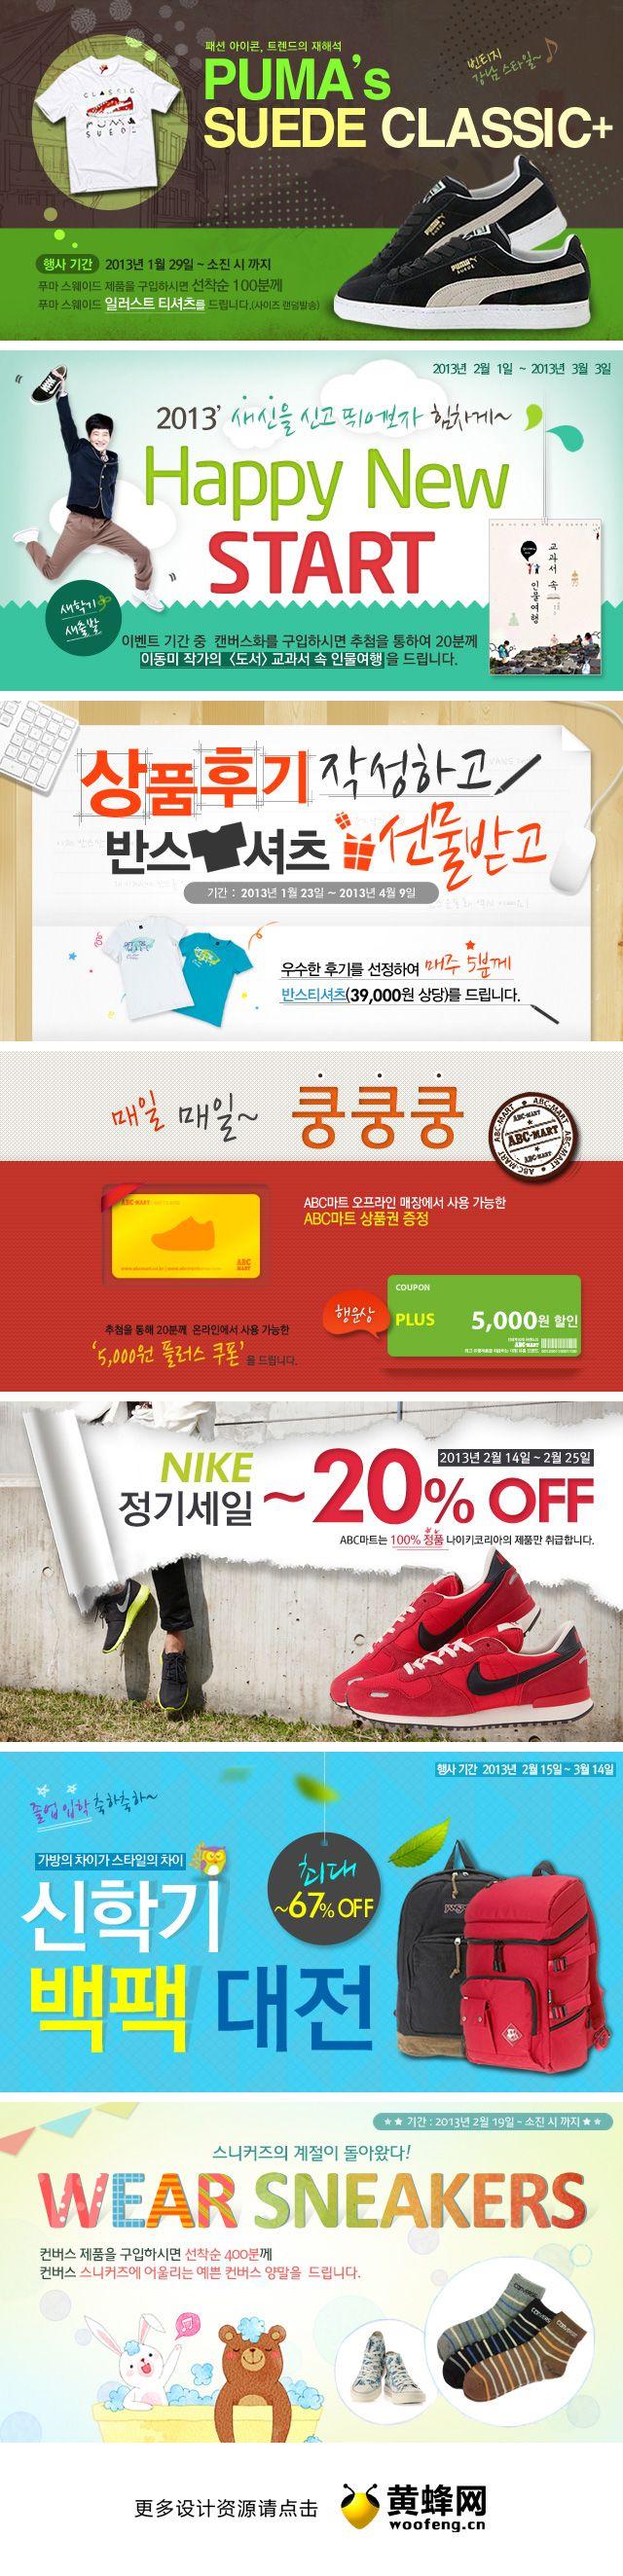 ABC-MART购物网站Banner设计欣赏0224,来源自黄蜂网http://woofeng.cn